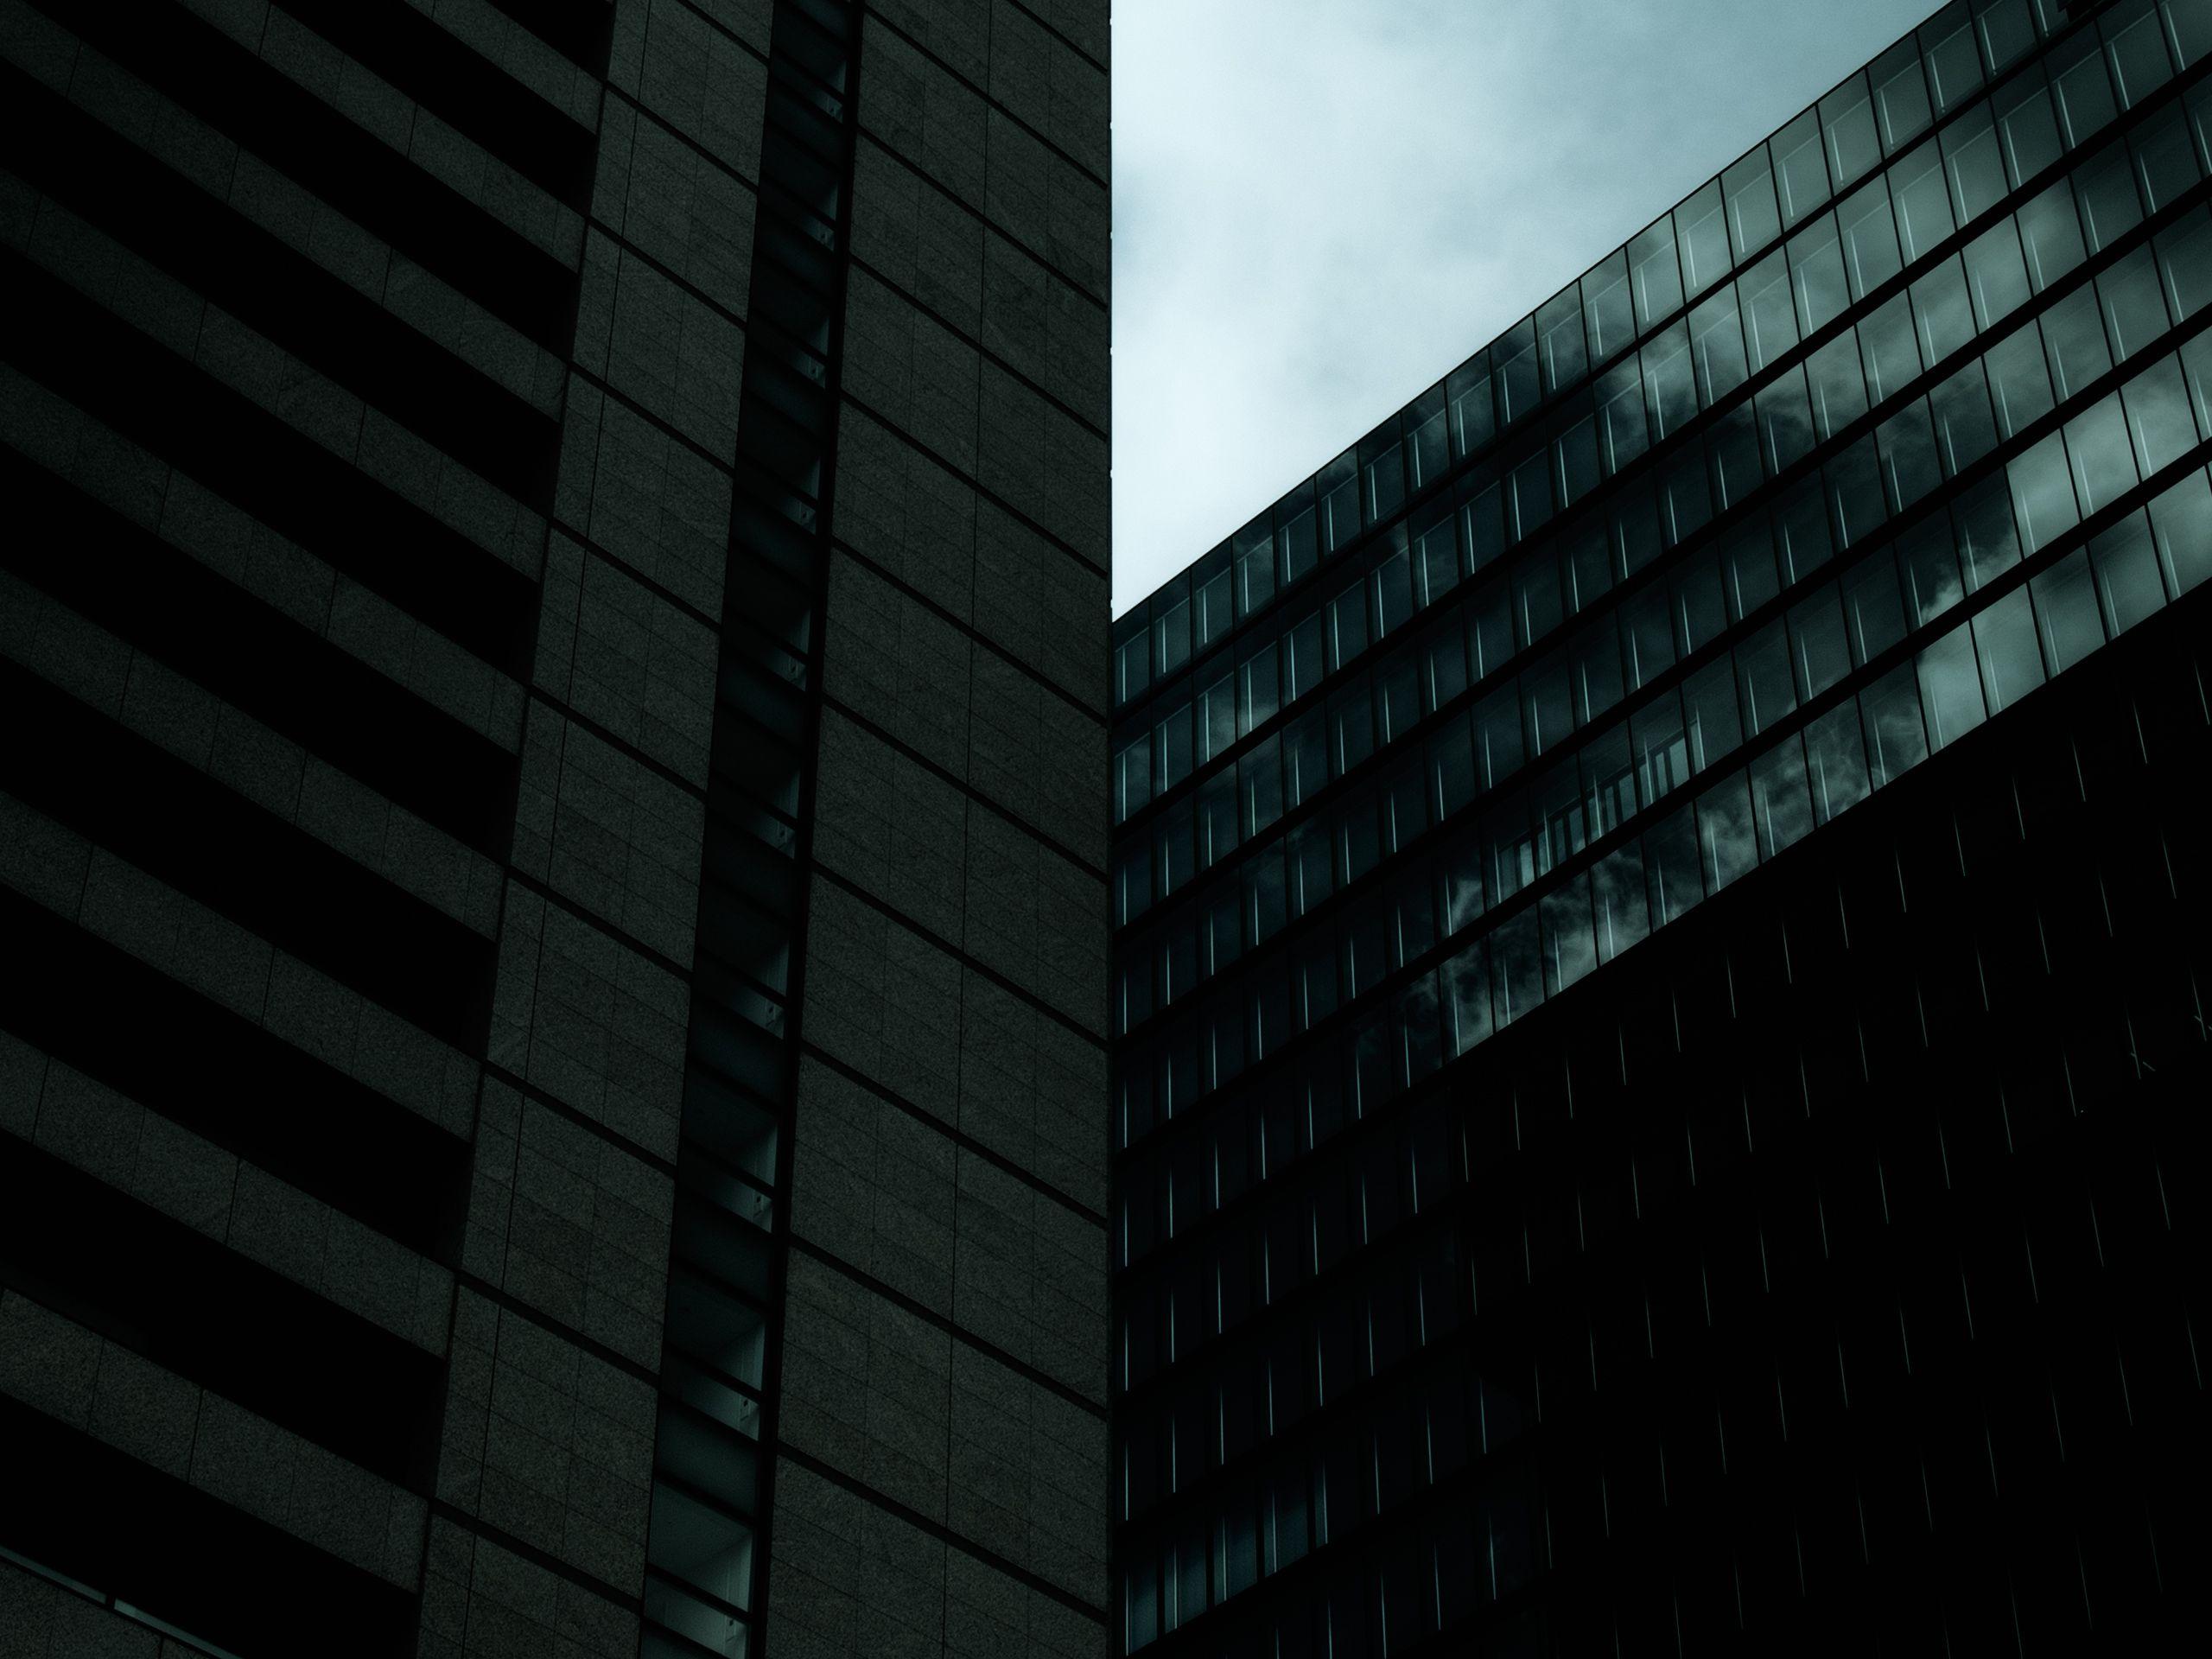 """Pain makes people change."" #photography #architecture #window #reflection   #ahsheegrek"